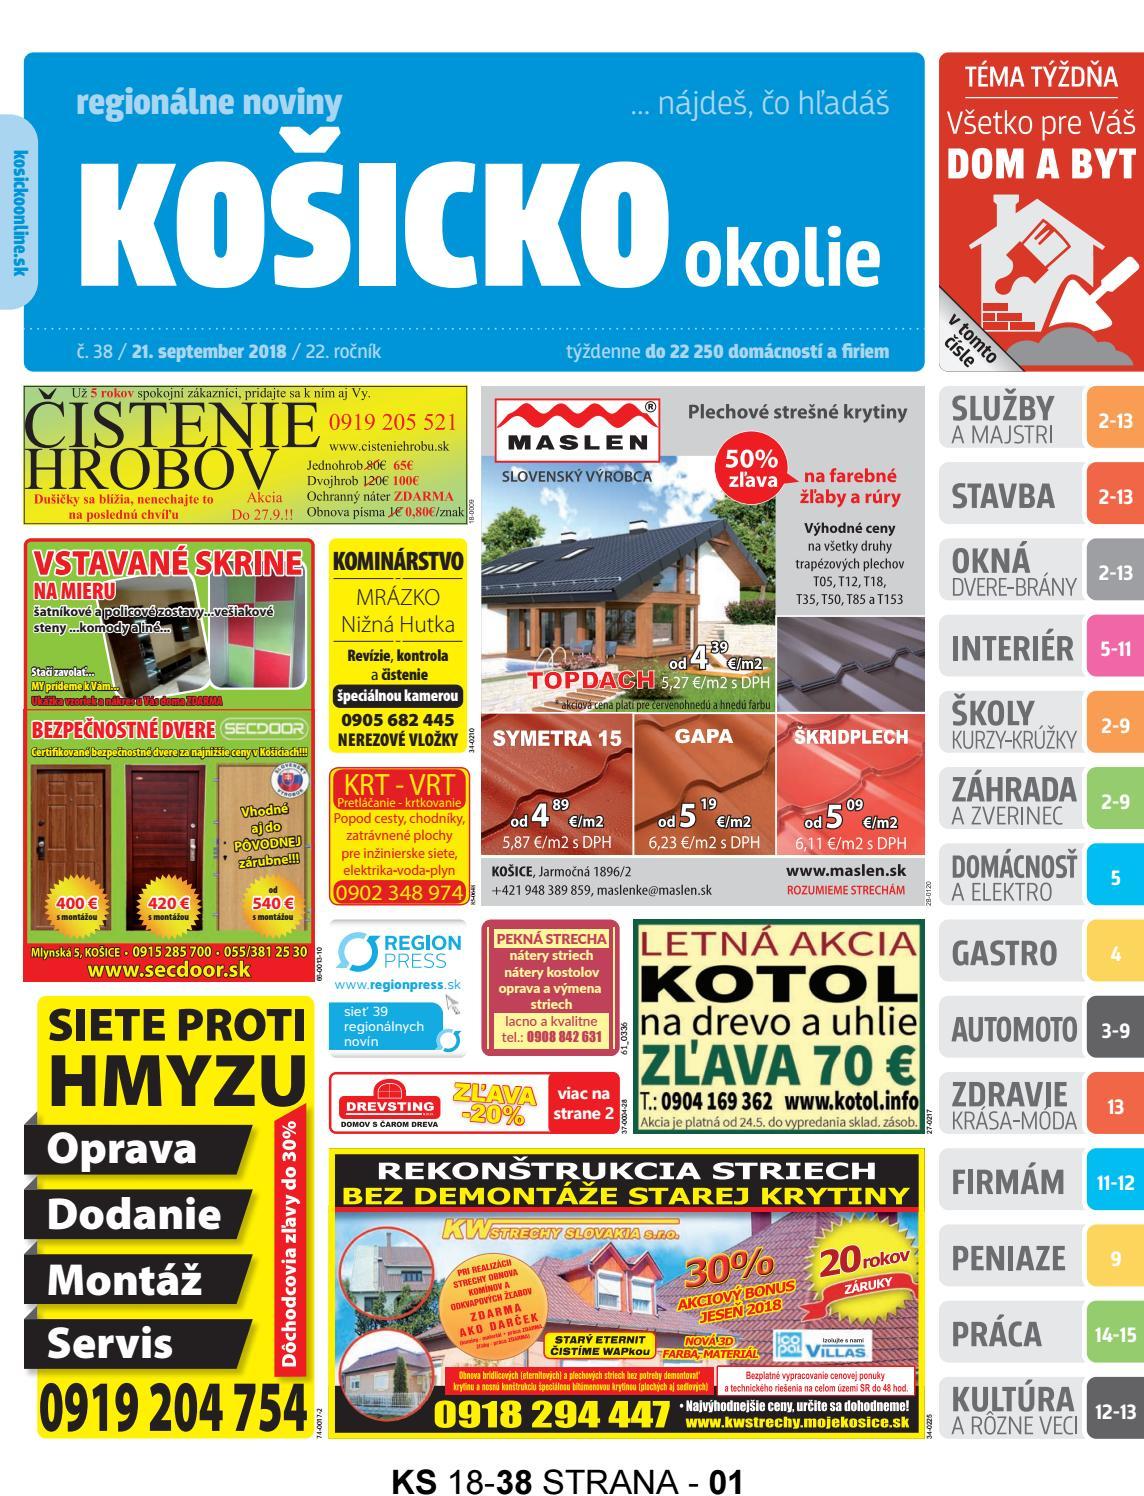 Román Online Zoznamka kontrak 9